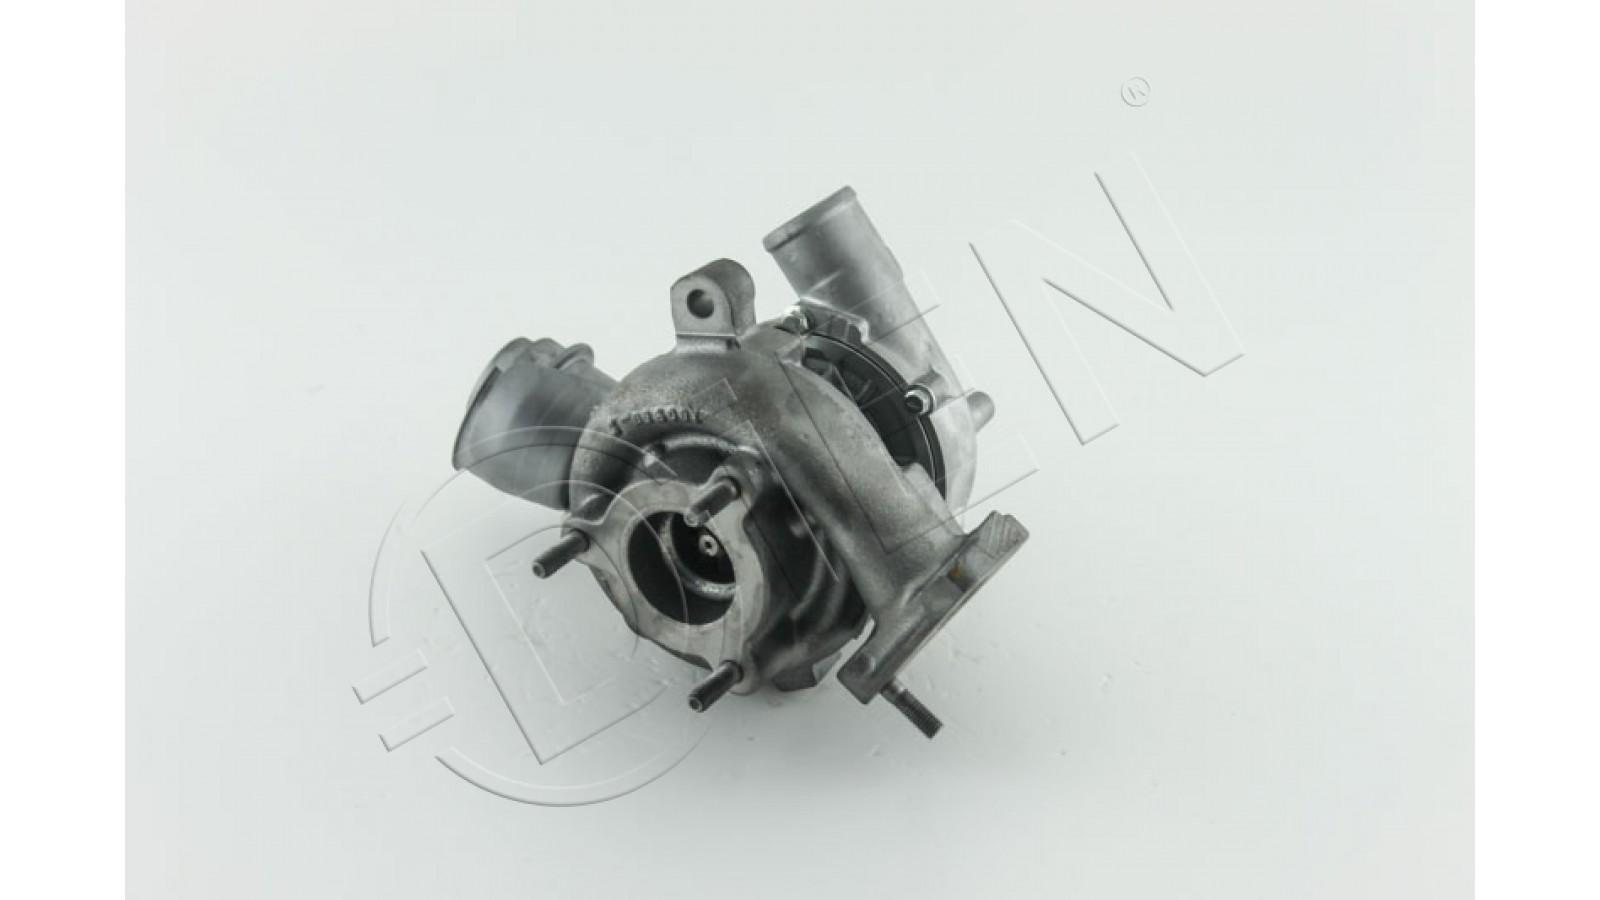 Turbocompressore  VOLKSWAGEN  LUPO  1.2 TDI 3L  61Cv  1191ccm  lug 1999 - lug 2005